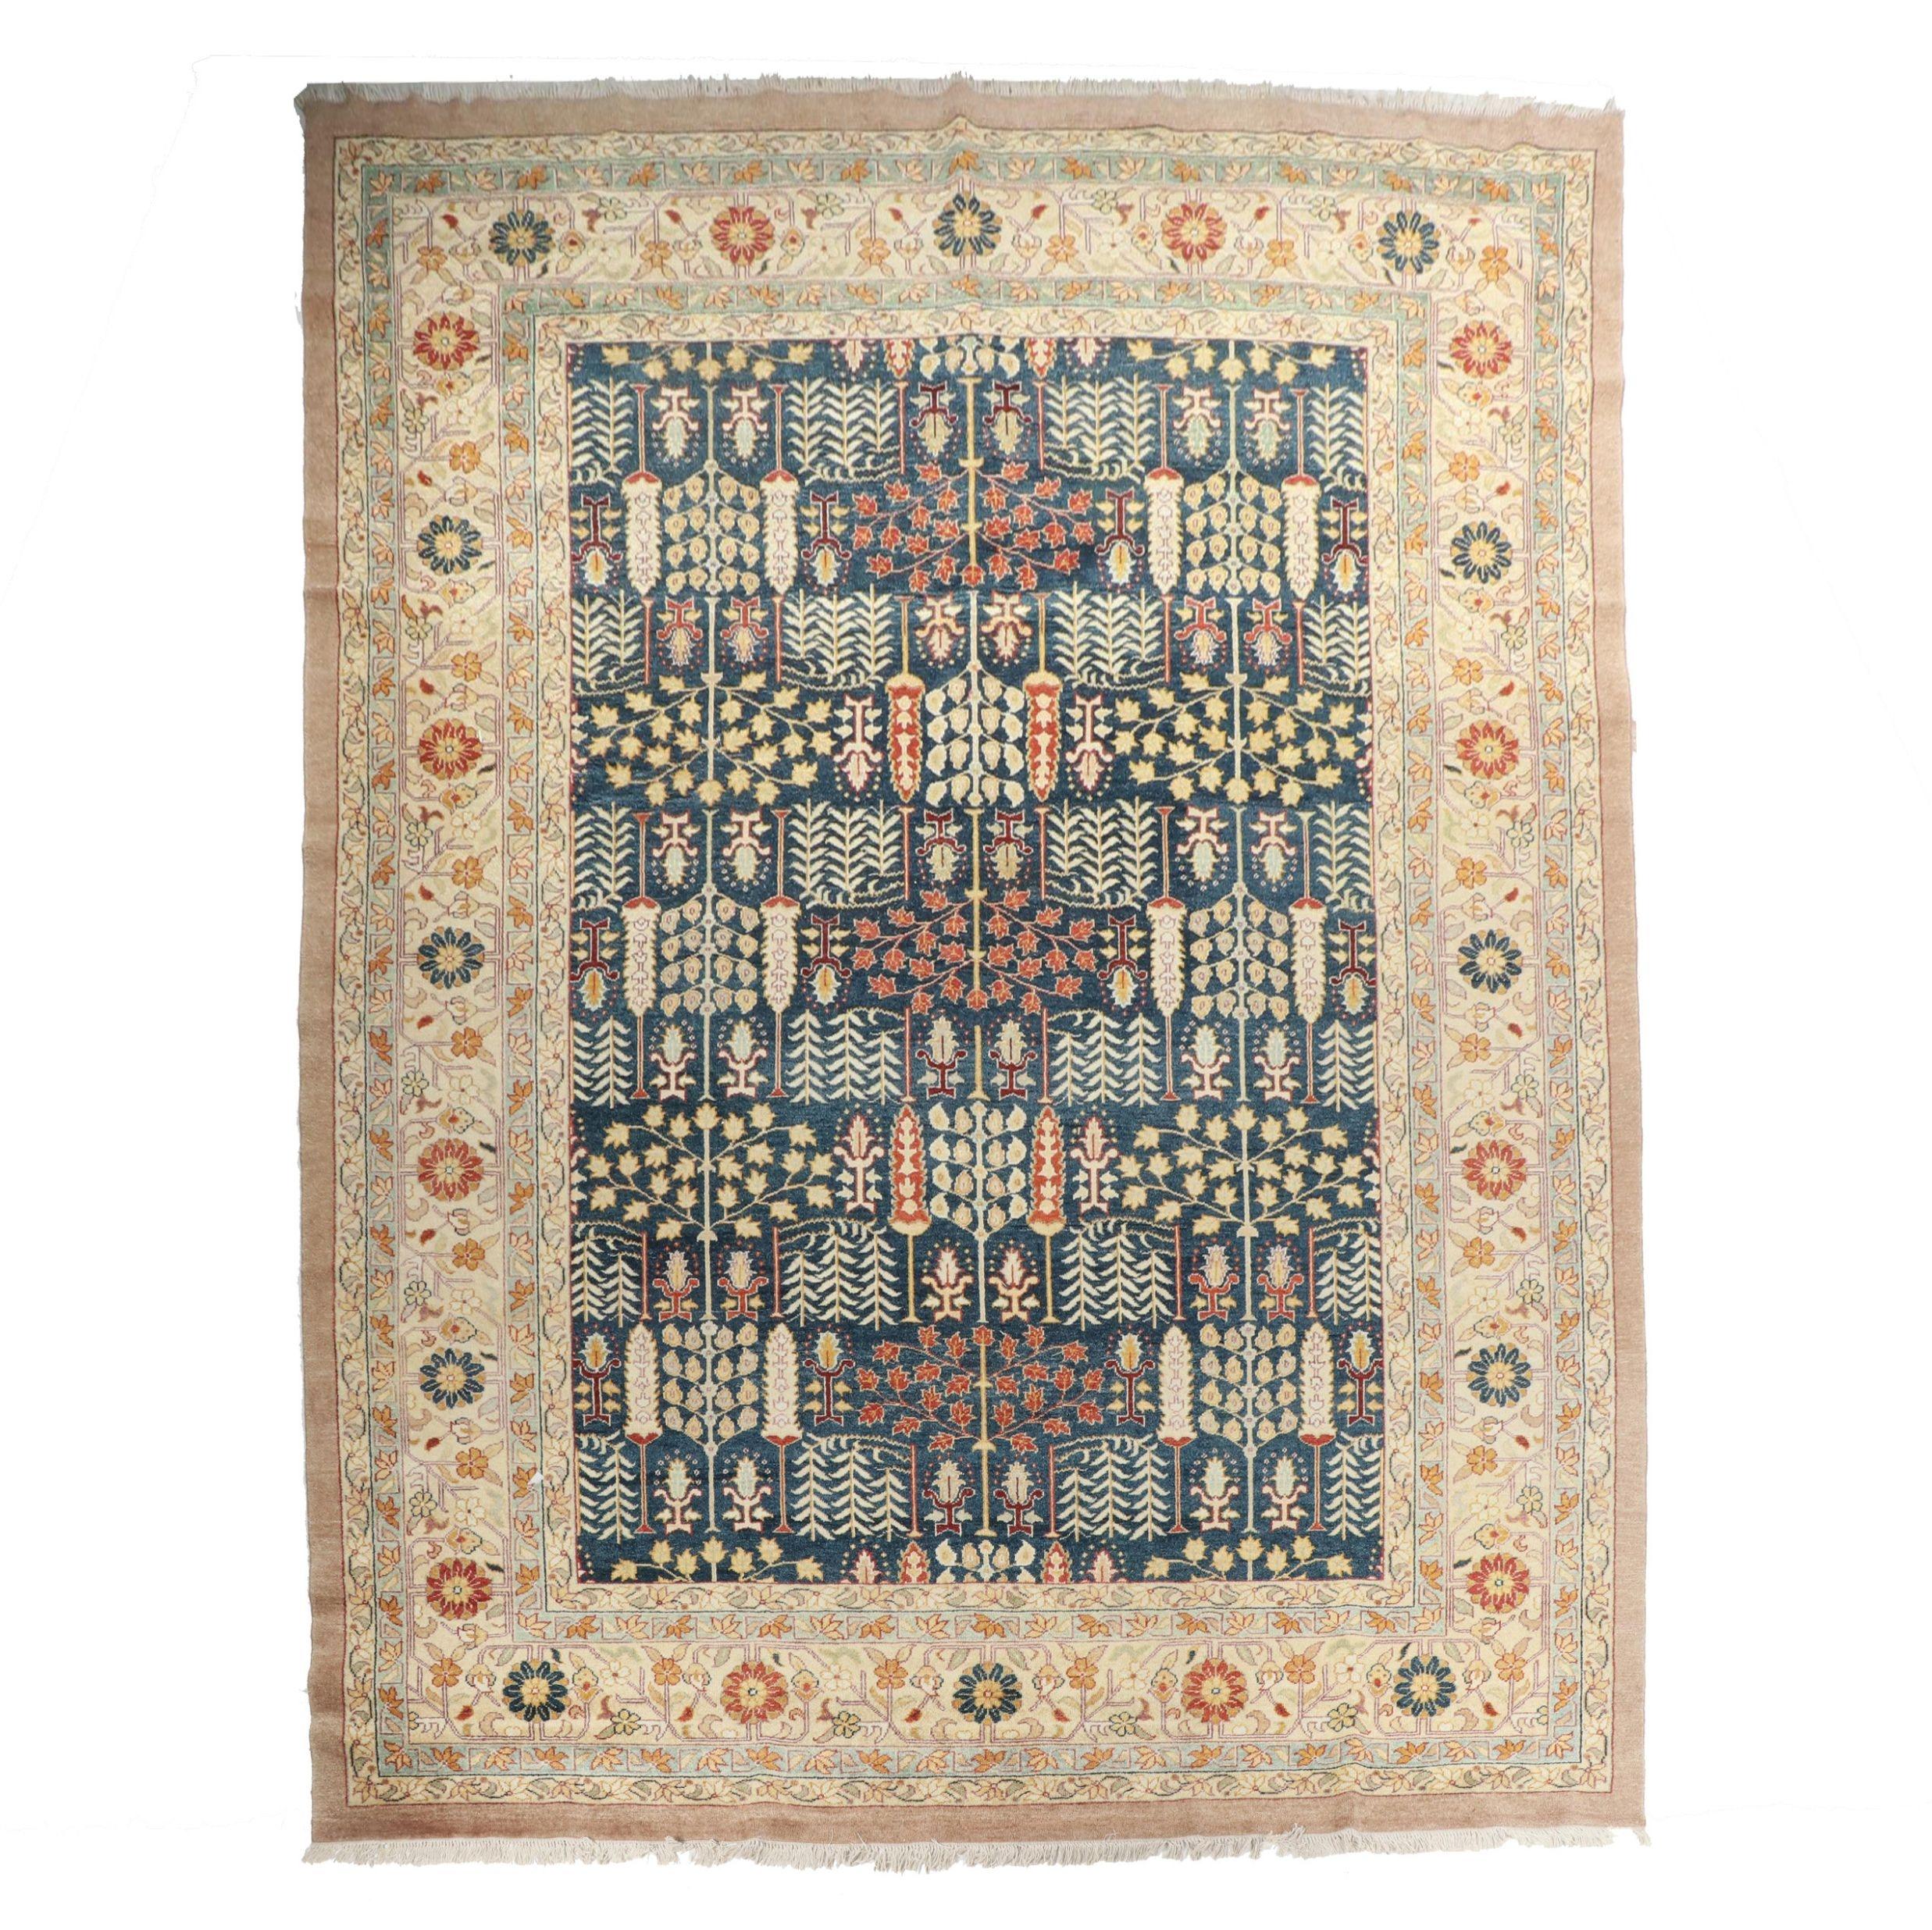 Power-Loomed Safavieh Persian Style Wool Room Sized Rug